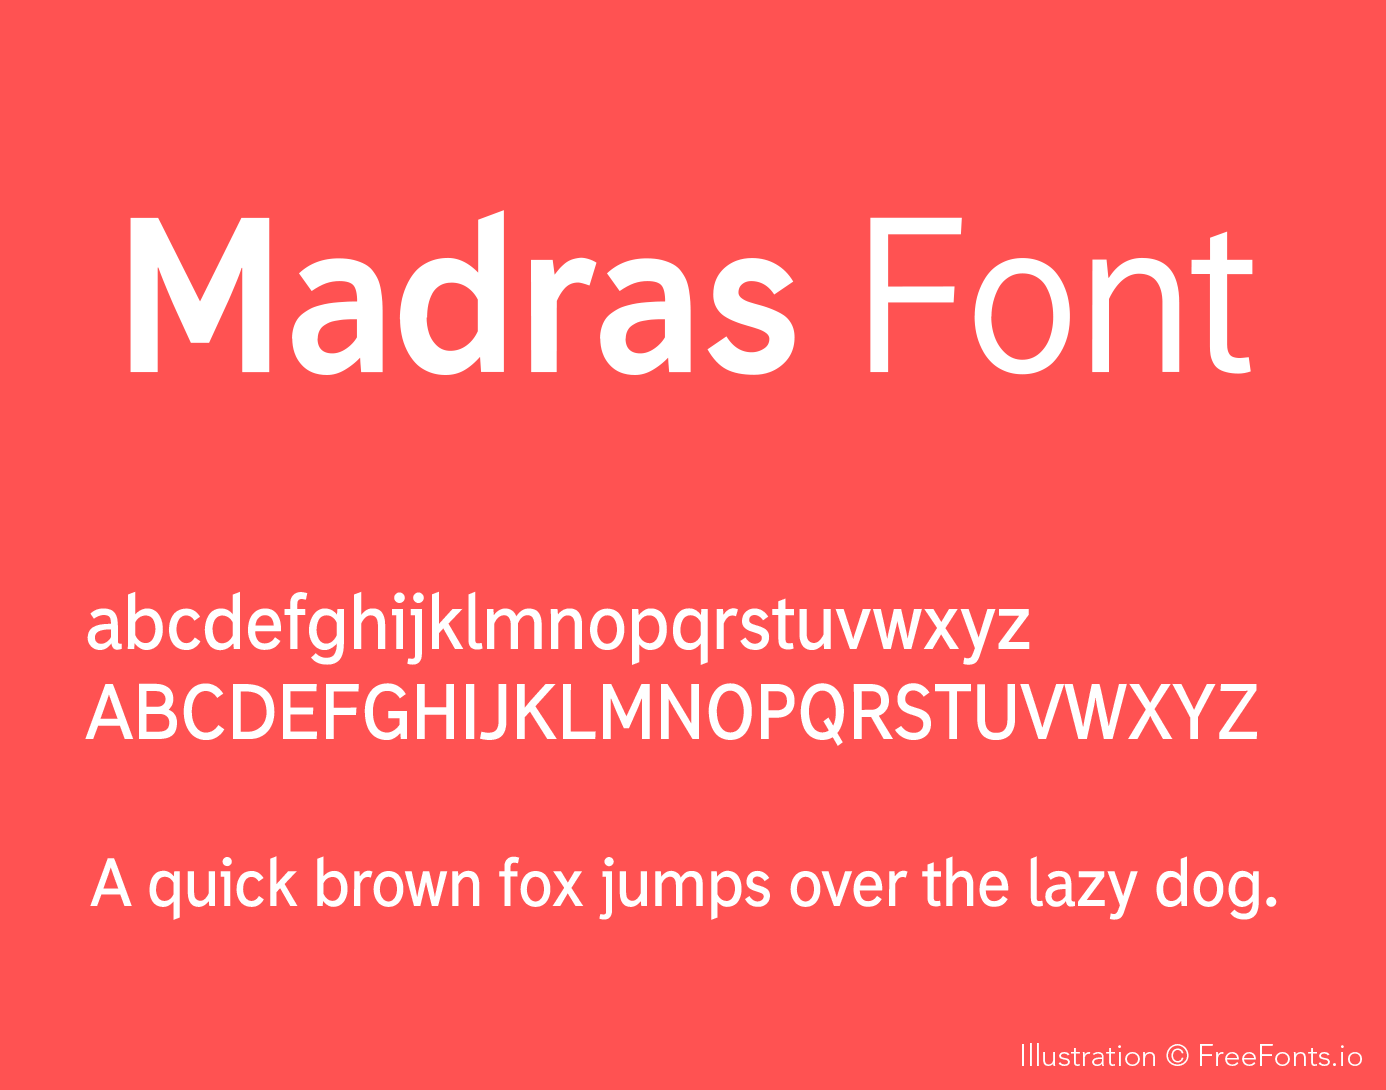 https://fontclarity.com/wp-content/uploads/2019/09/madras-font-download-0.png Free Download